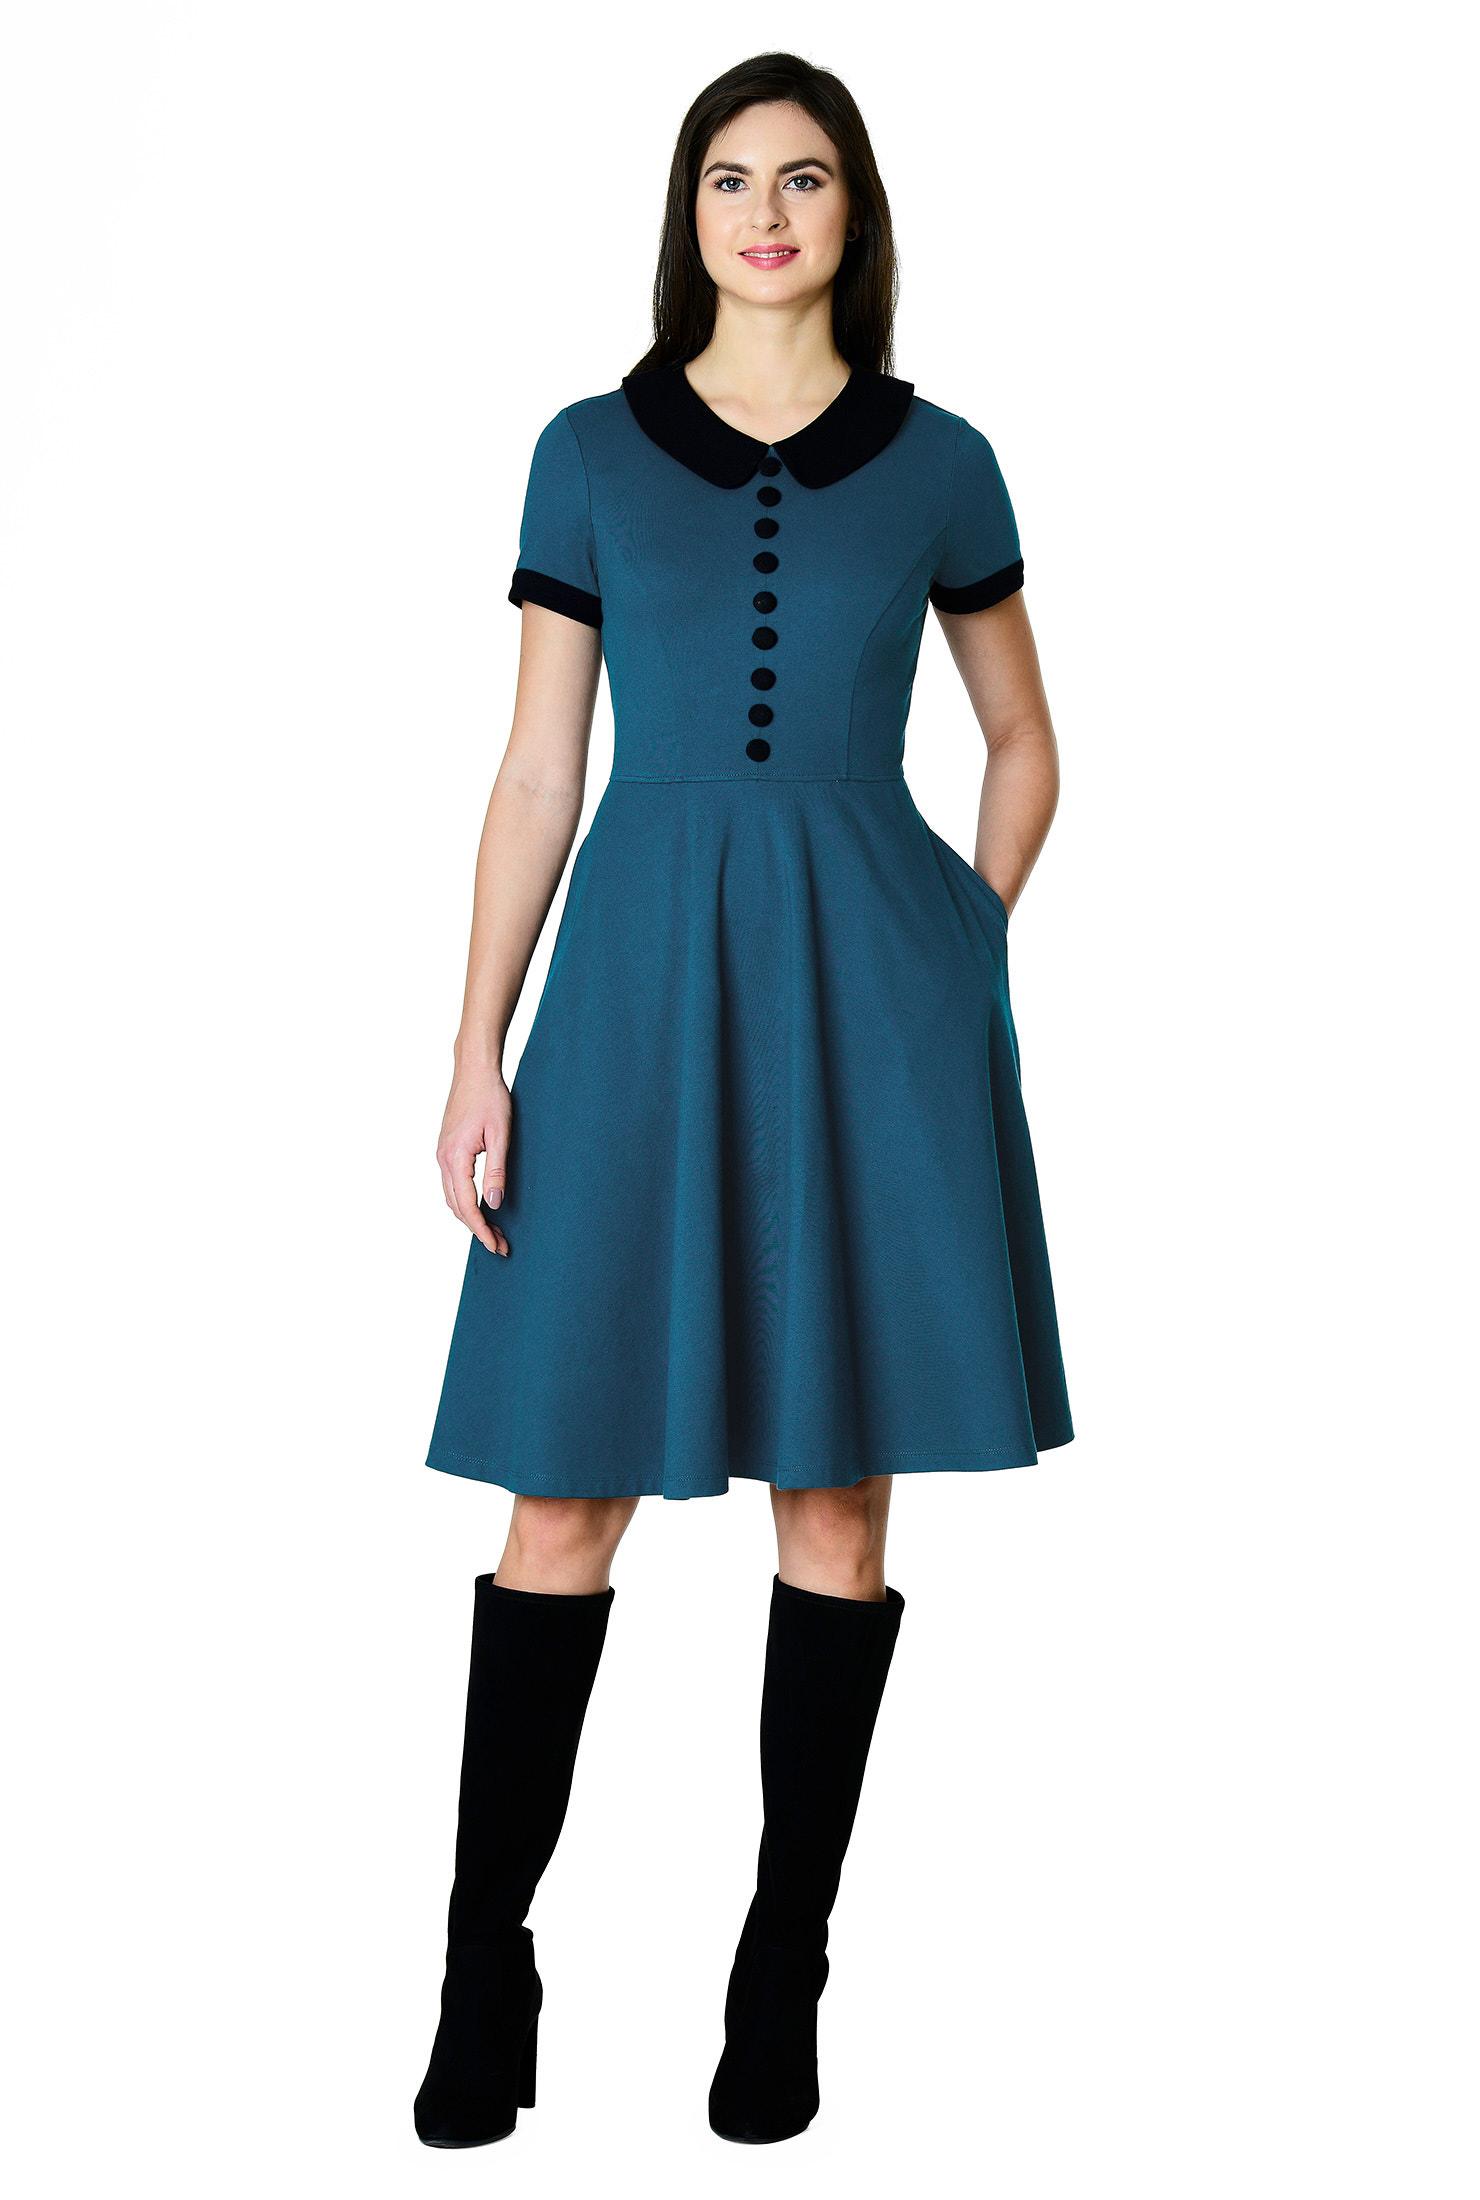 , back zip dresses, Contrast Collar Dresses, elastic waist dresses, fit-and-flare dresses, knee length dresses, peacock blue dresses, pocket dresses, Short sleeve dresses